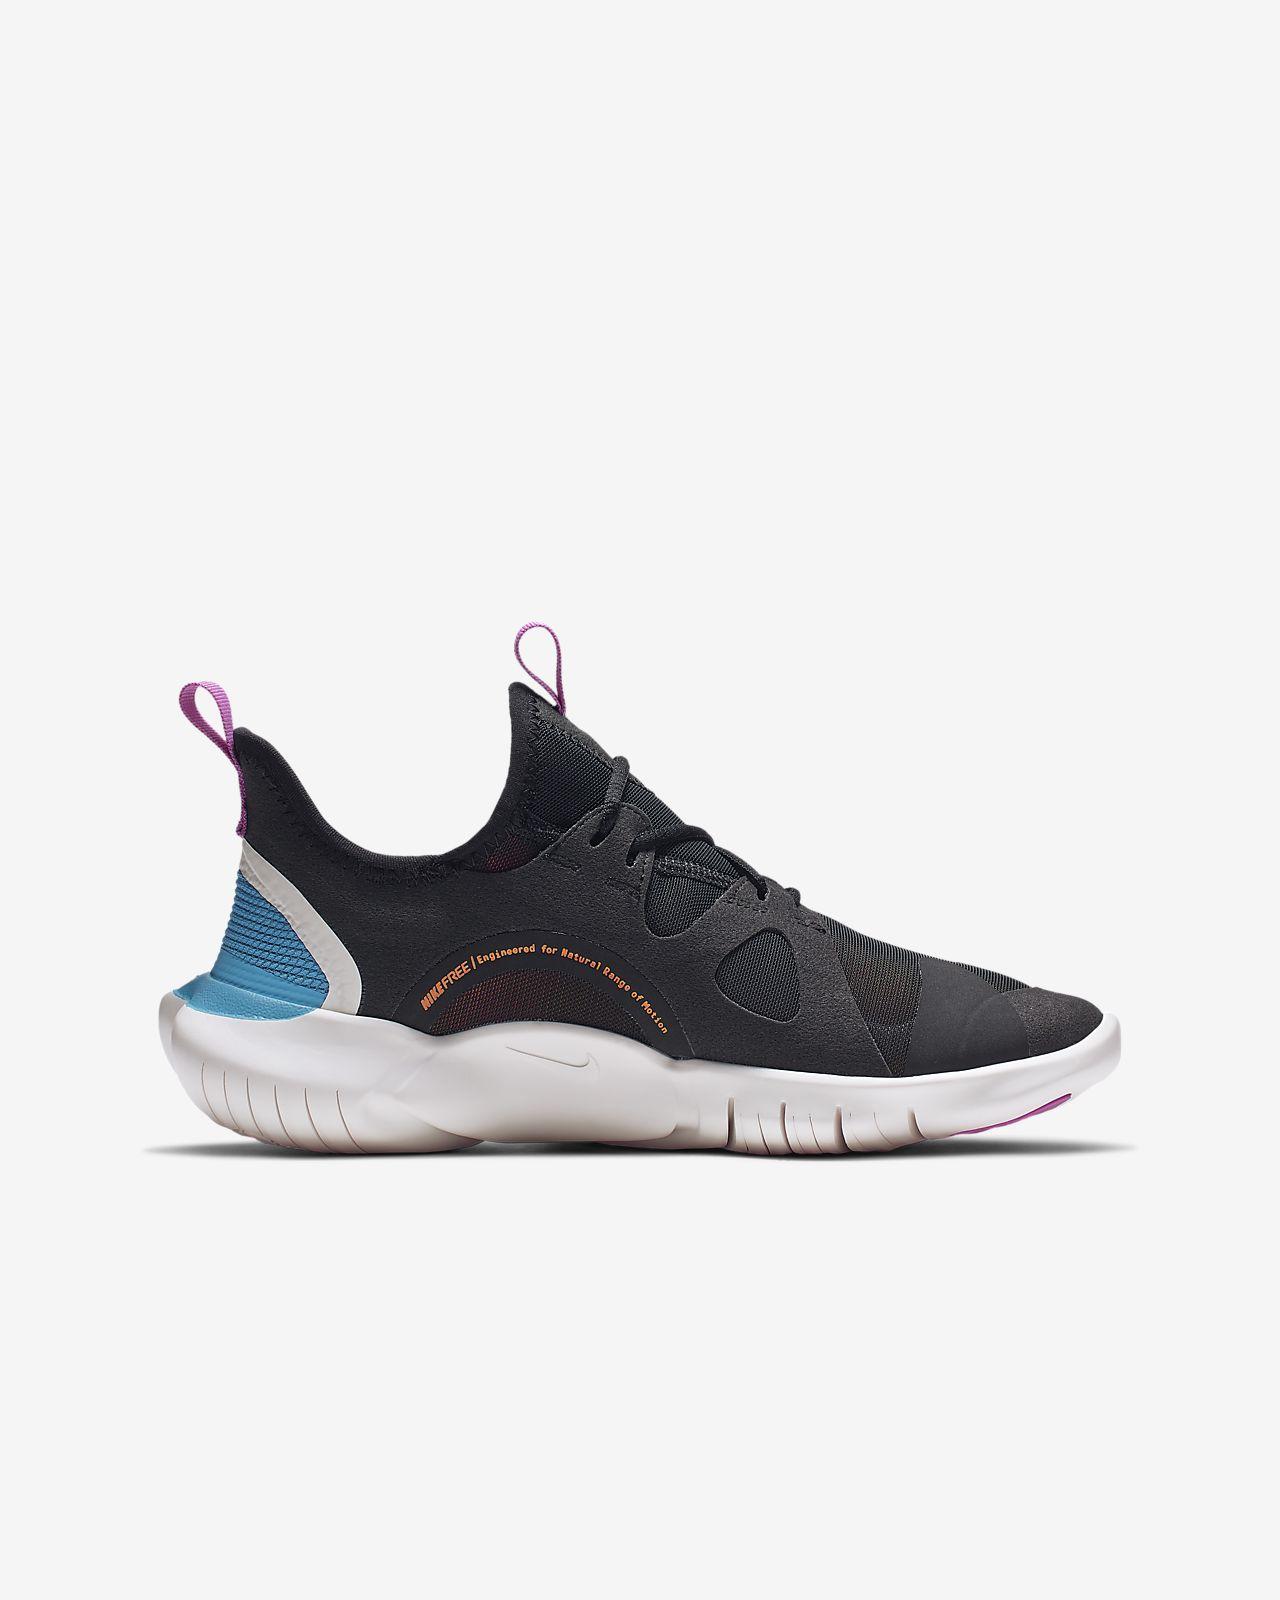 Nike FREE RN 5.0 RUNNING SHOES WOMENS Paragon Sports